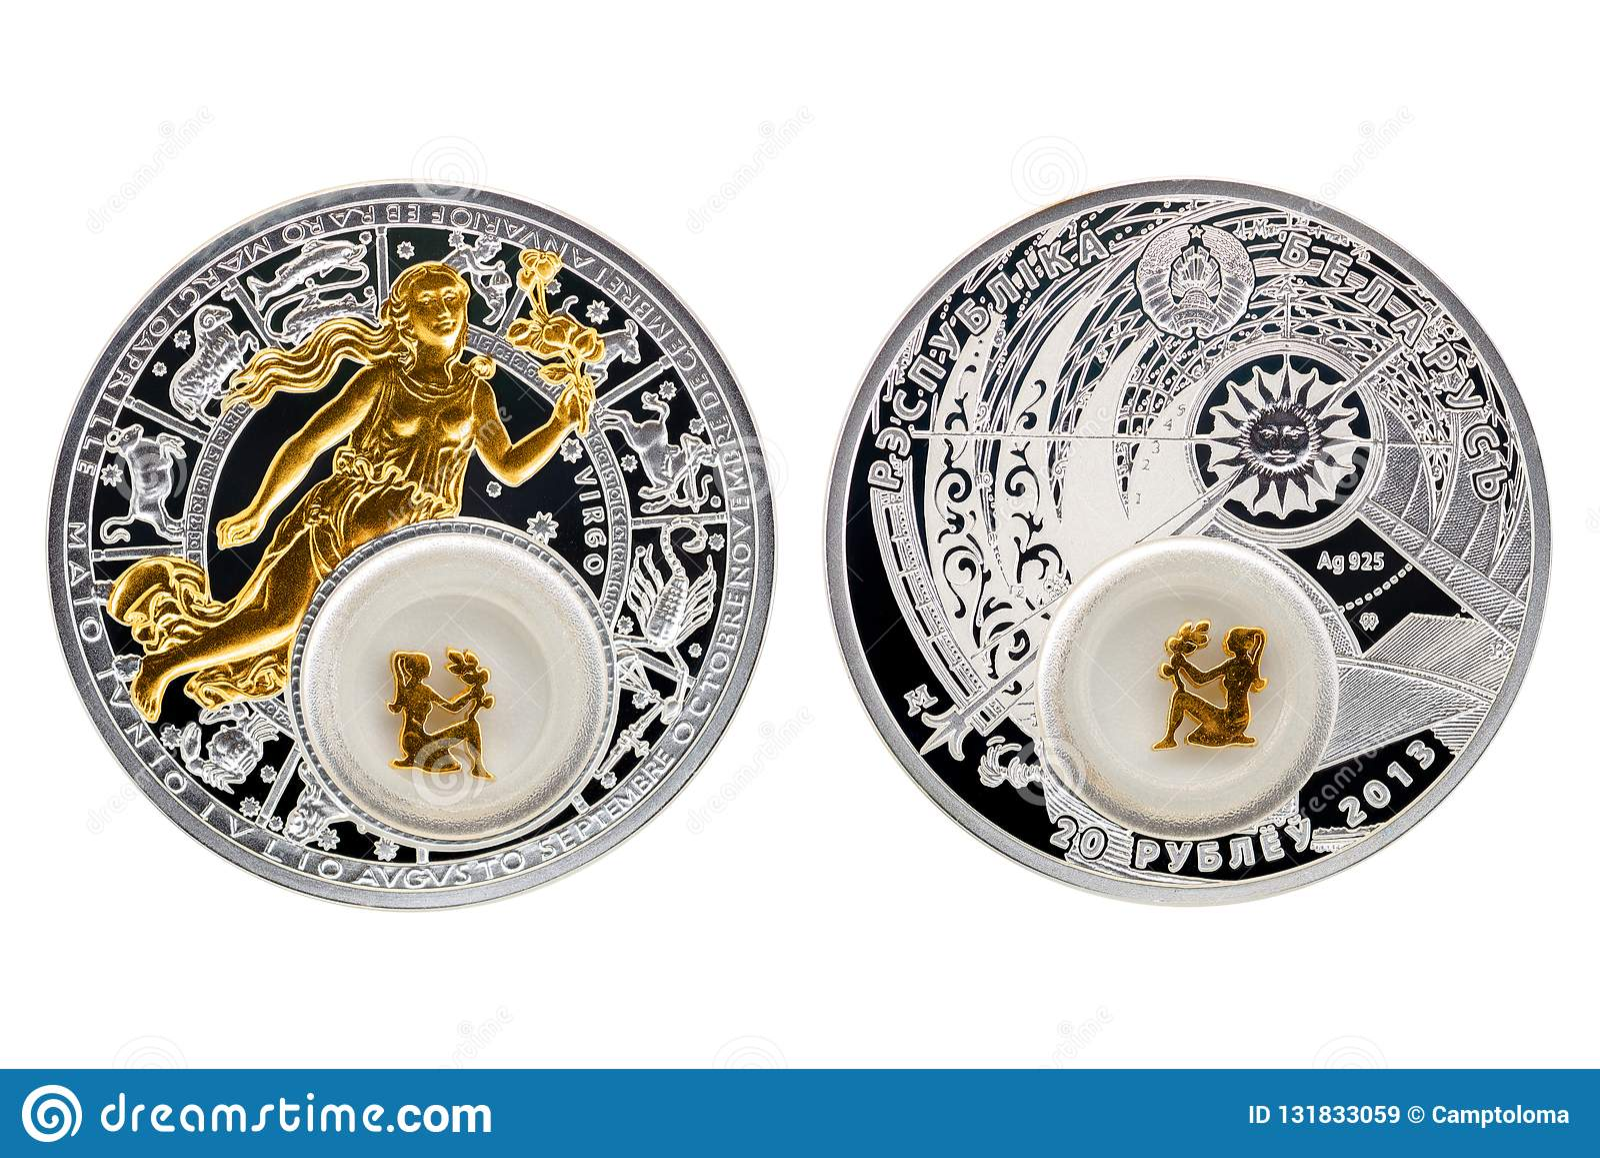 Białoruś srebnej monety astrologii Virgo